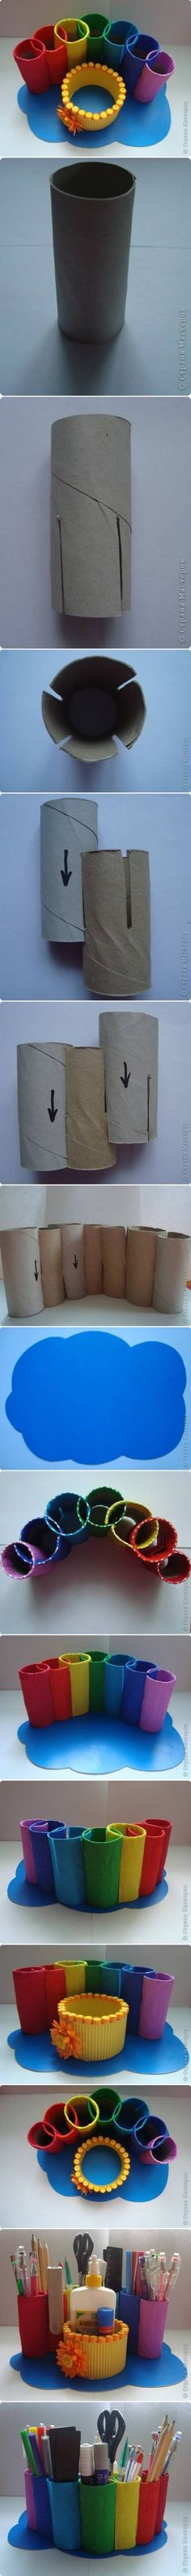 DIY Rainbow Desk Organizer from Toilet Paper Roll, Paper Roll Desk Organizer by…